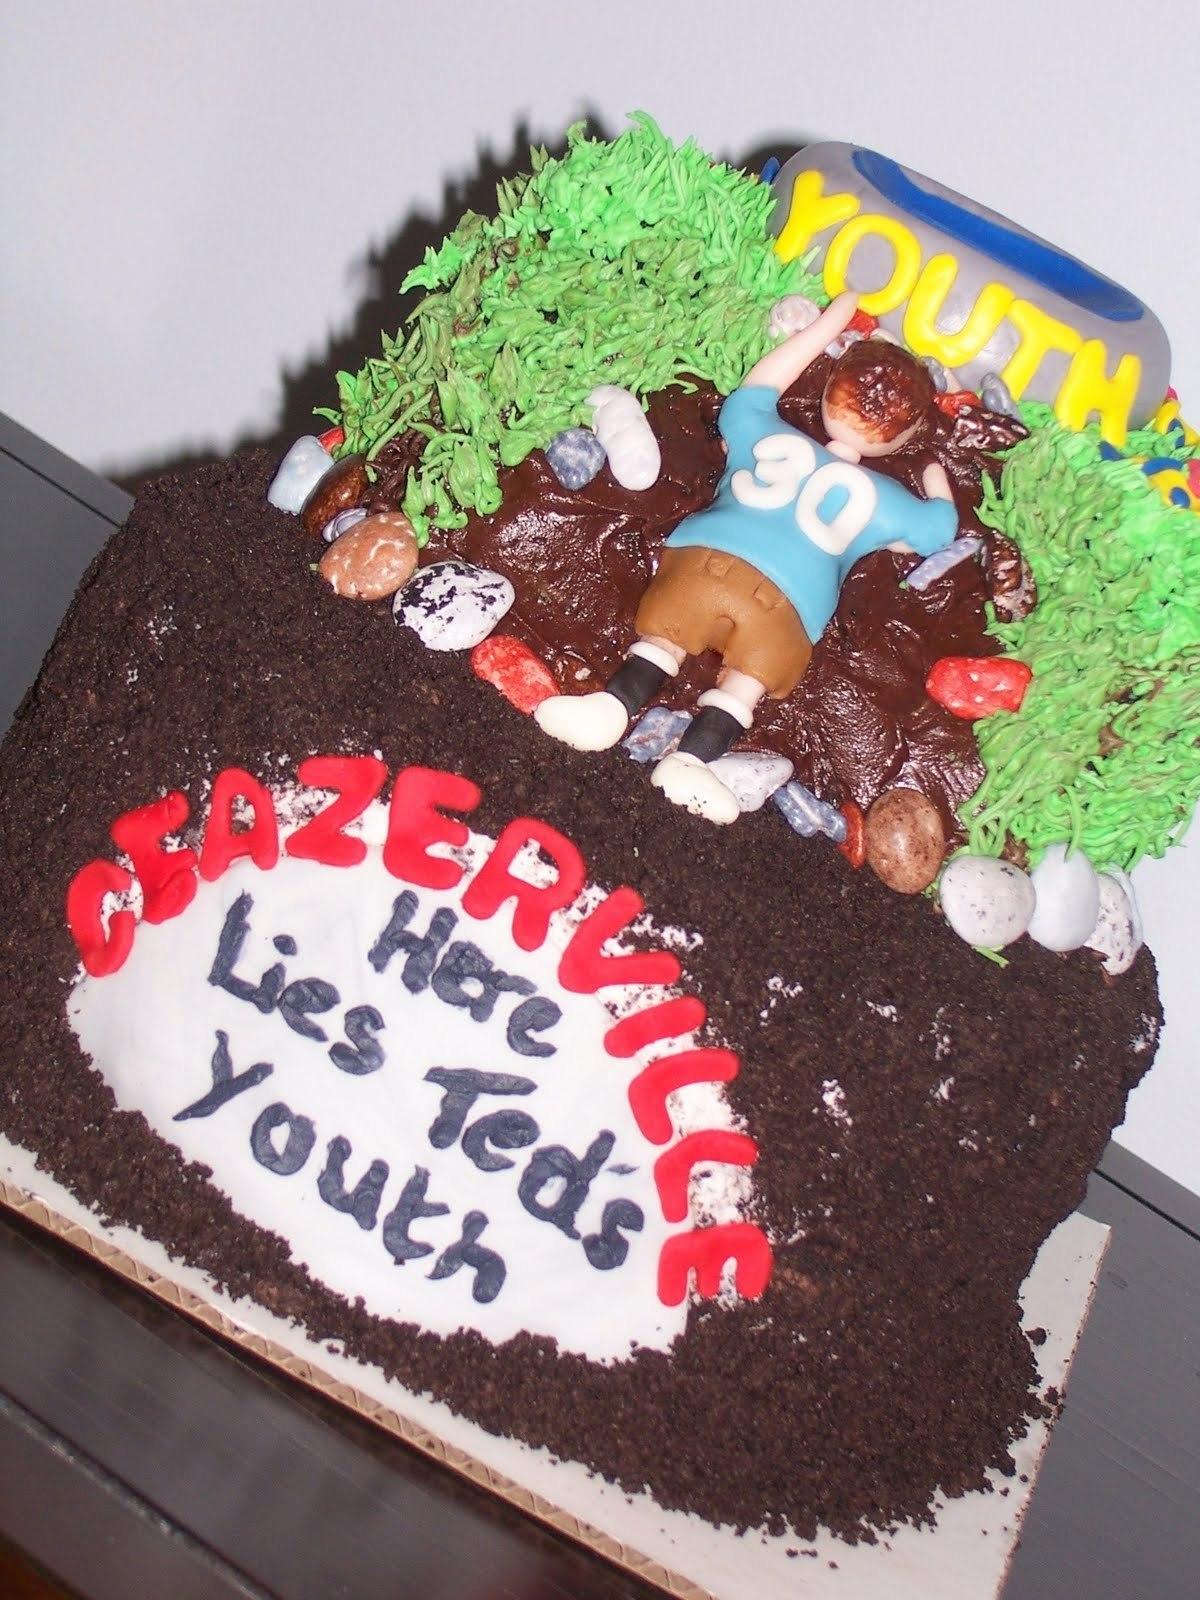 30th birthday cake designs for men wallpaper wallpaper 1200x1600jpg 1200x1600